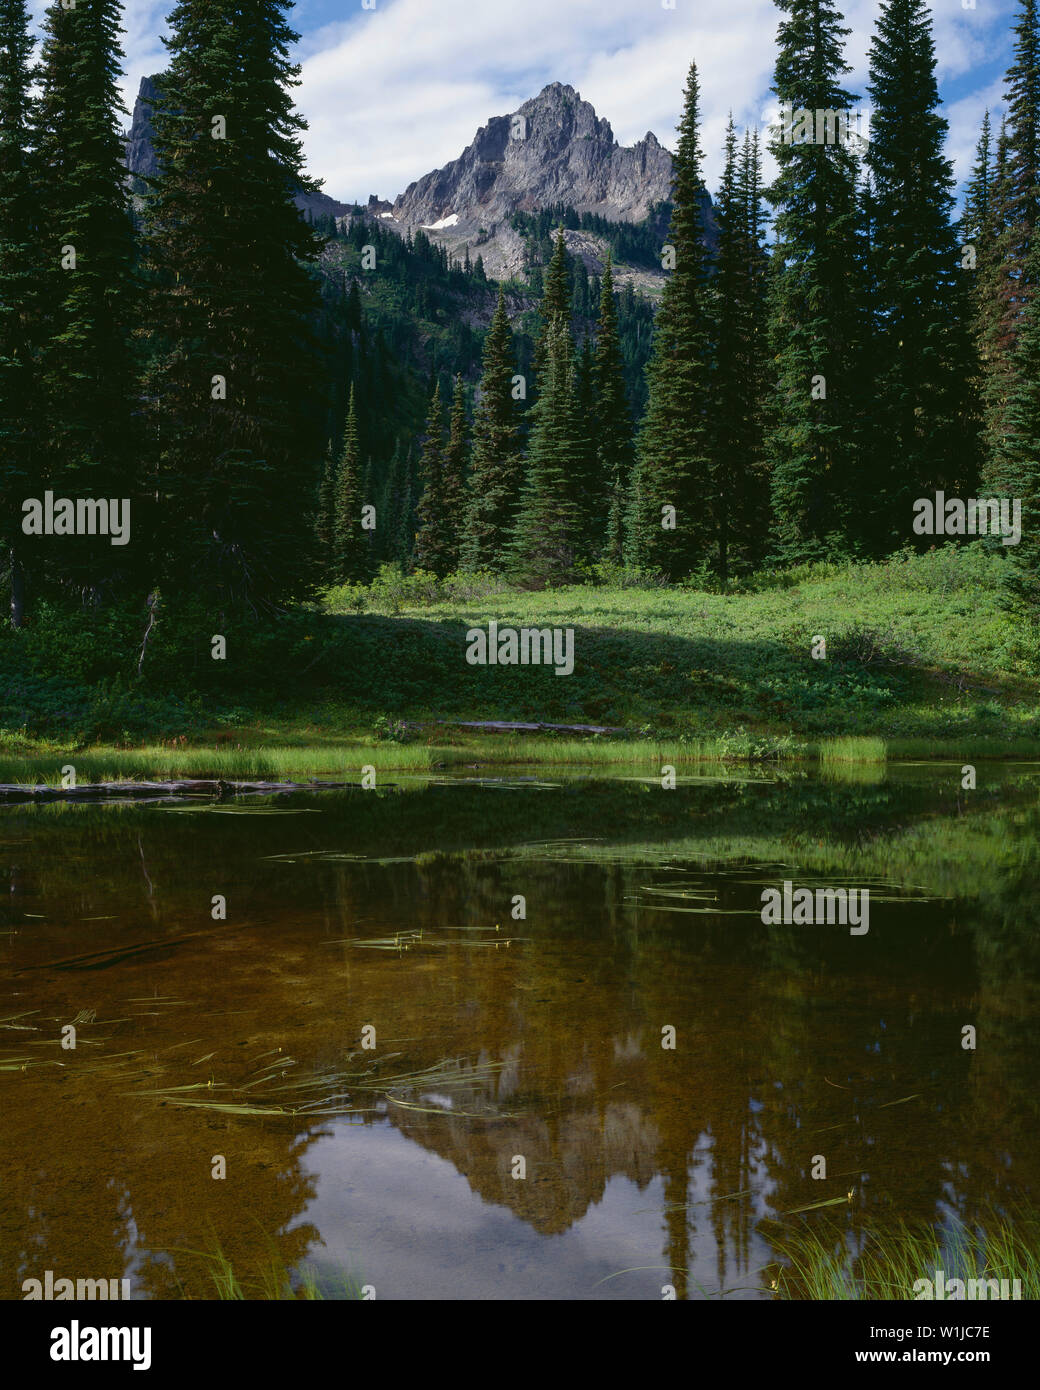 USA, Washington, Mt. Rainier National Park, Pinnacle Peak rises beyond Reflection Lakes. - Stock Image